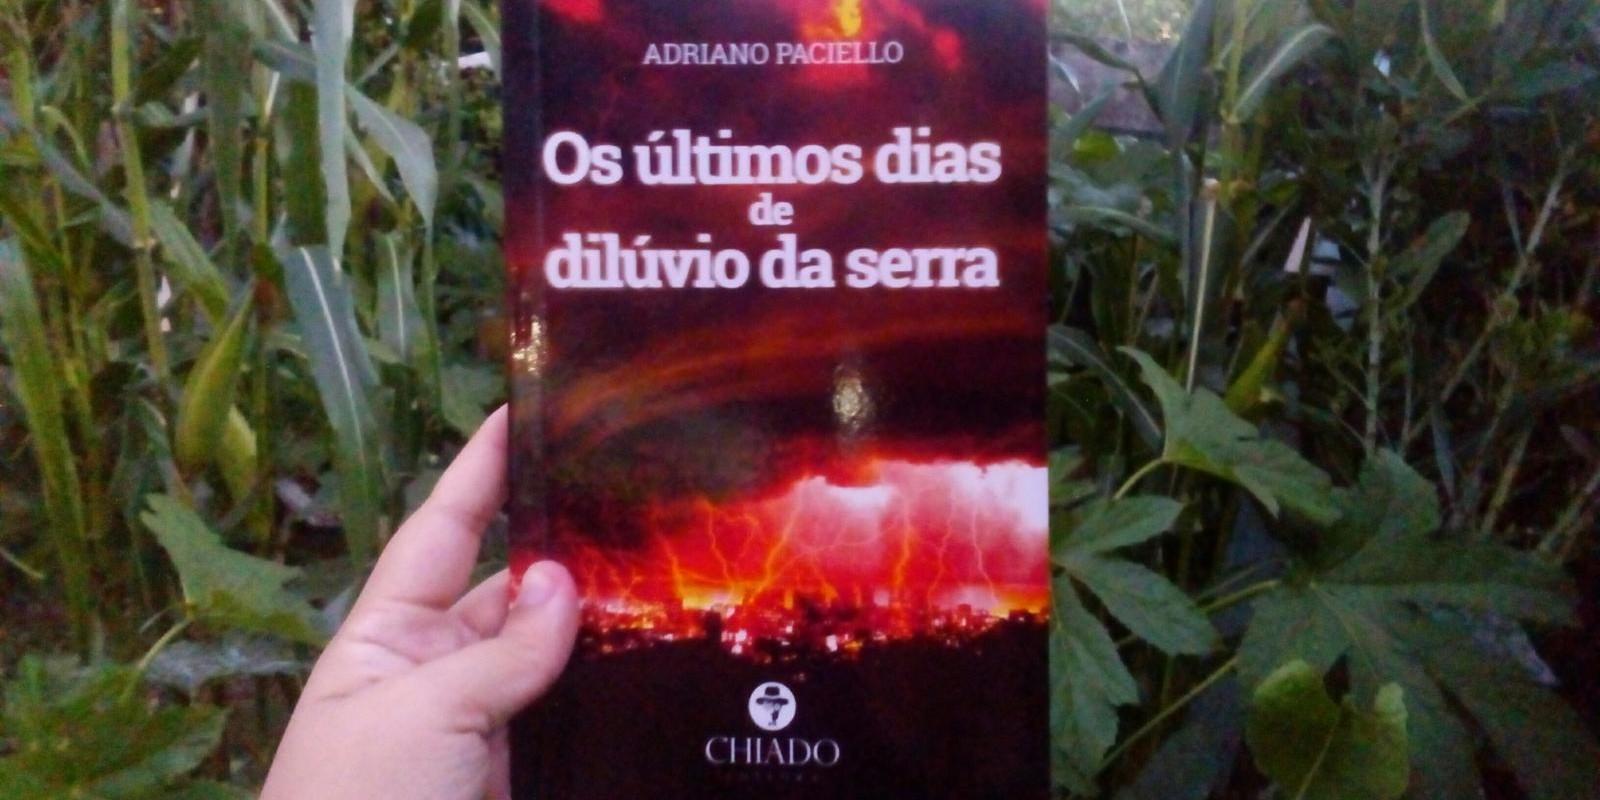 [OS ÚLTIMOS DIAS DE DILÚVIO DA SERRA - Adriano Paciello]